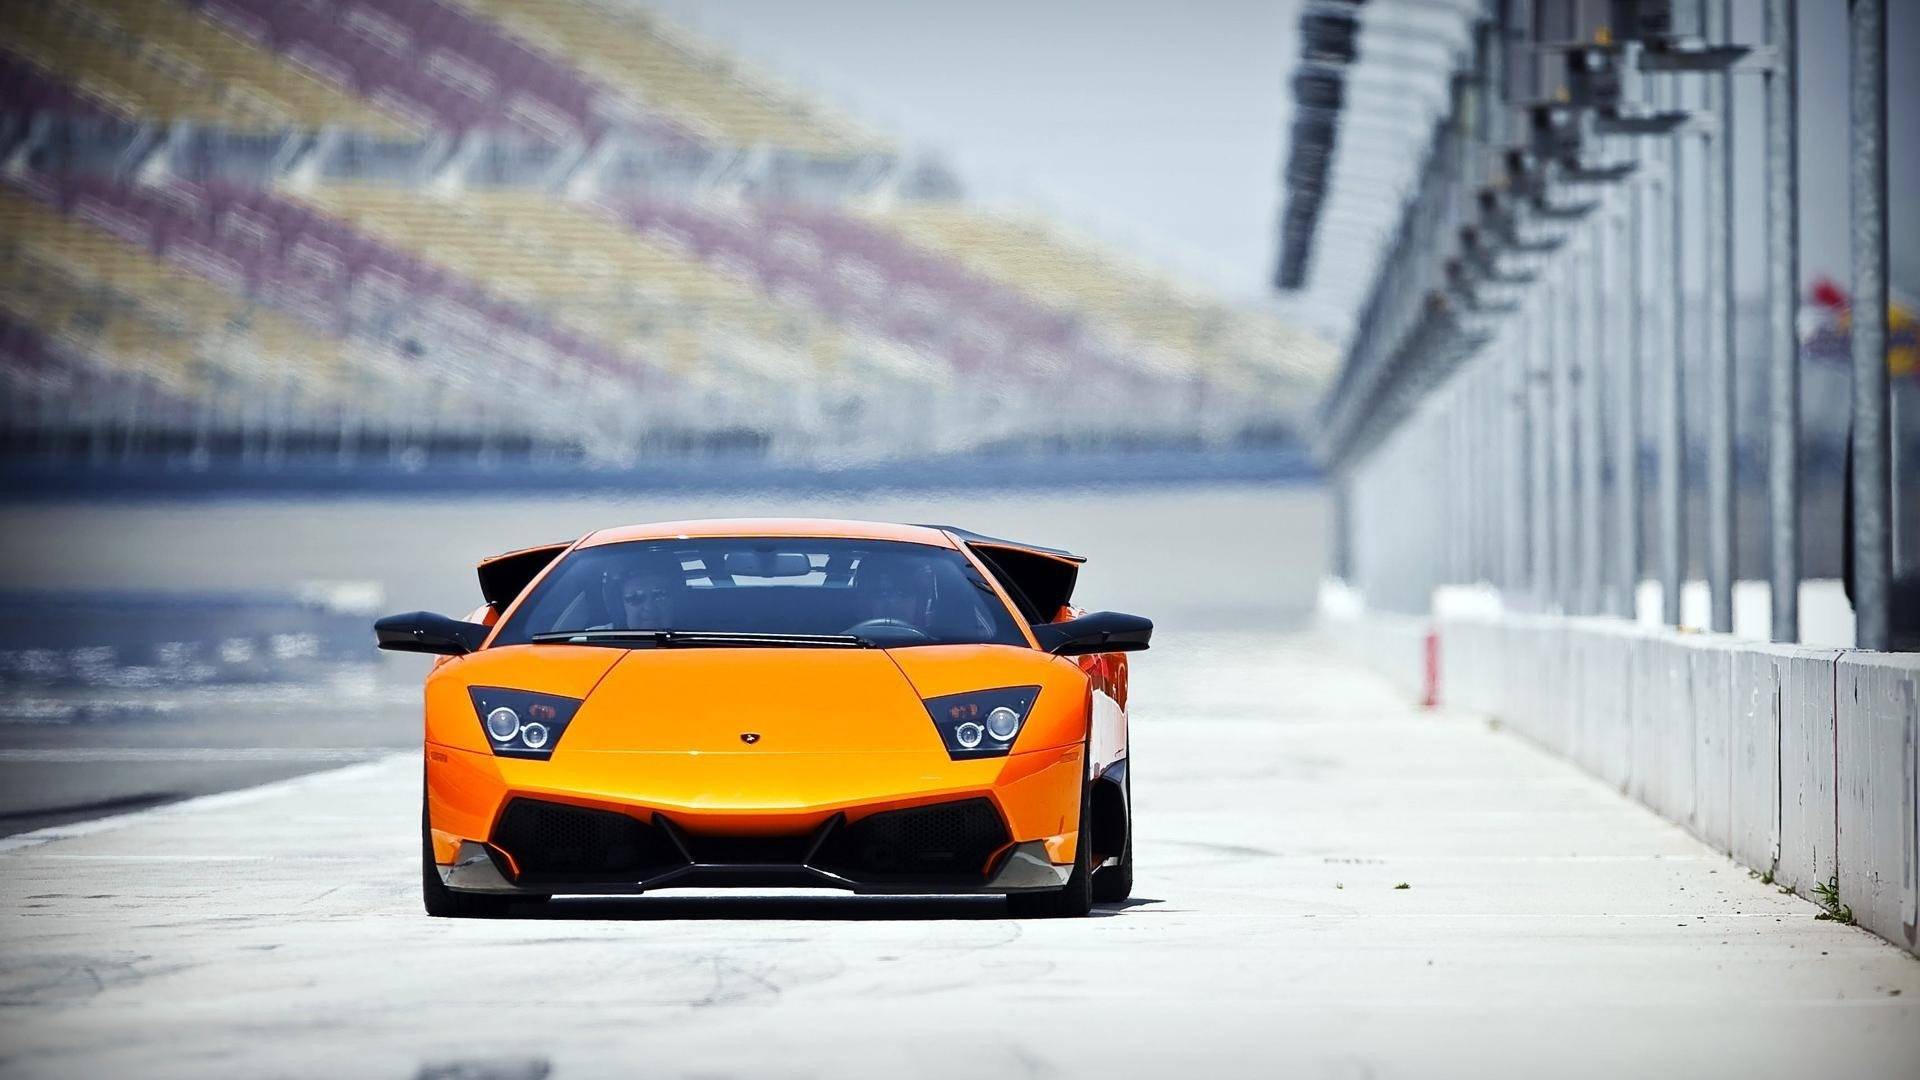 Lamborghini Murcielago SV Track HD Wallpaper